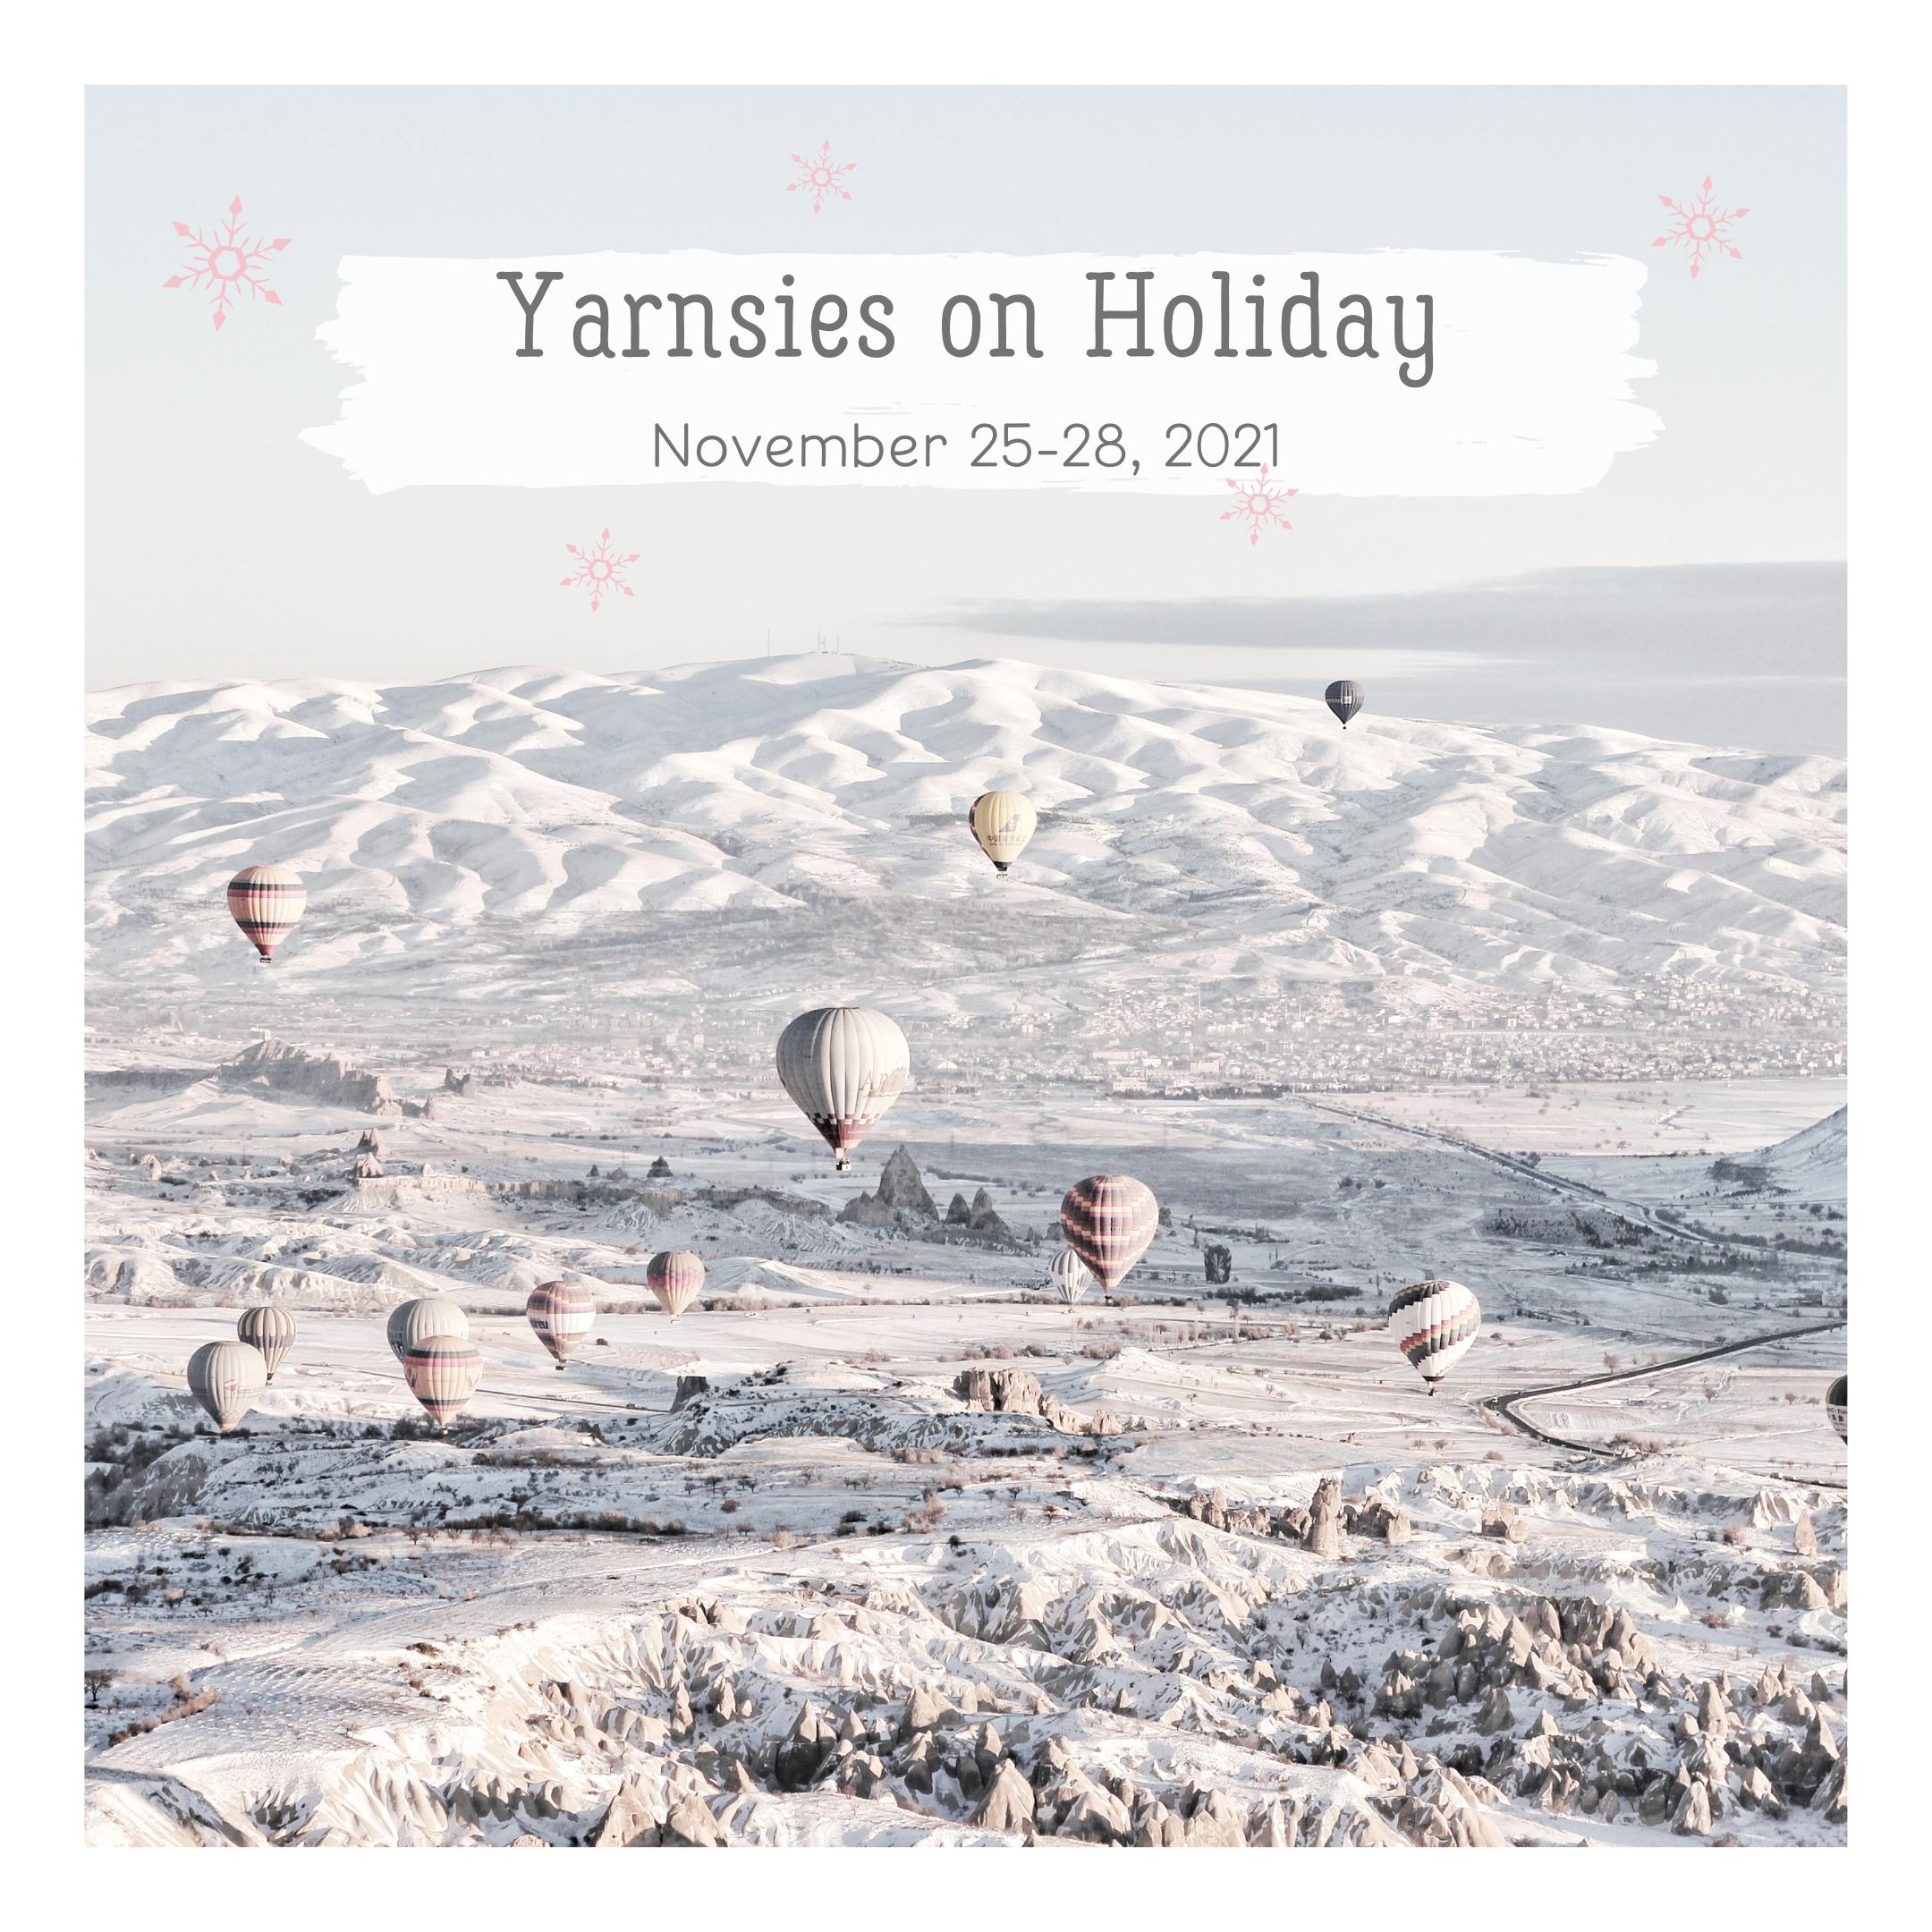 Yarnsies on Holiday